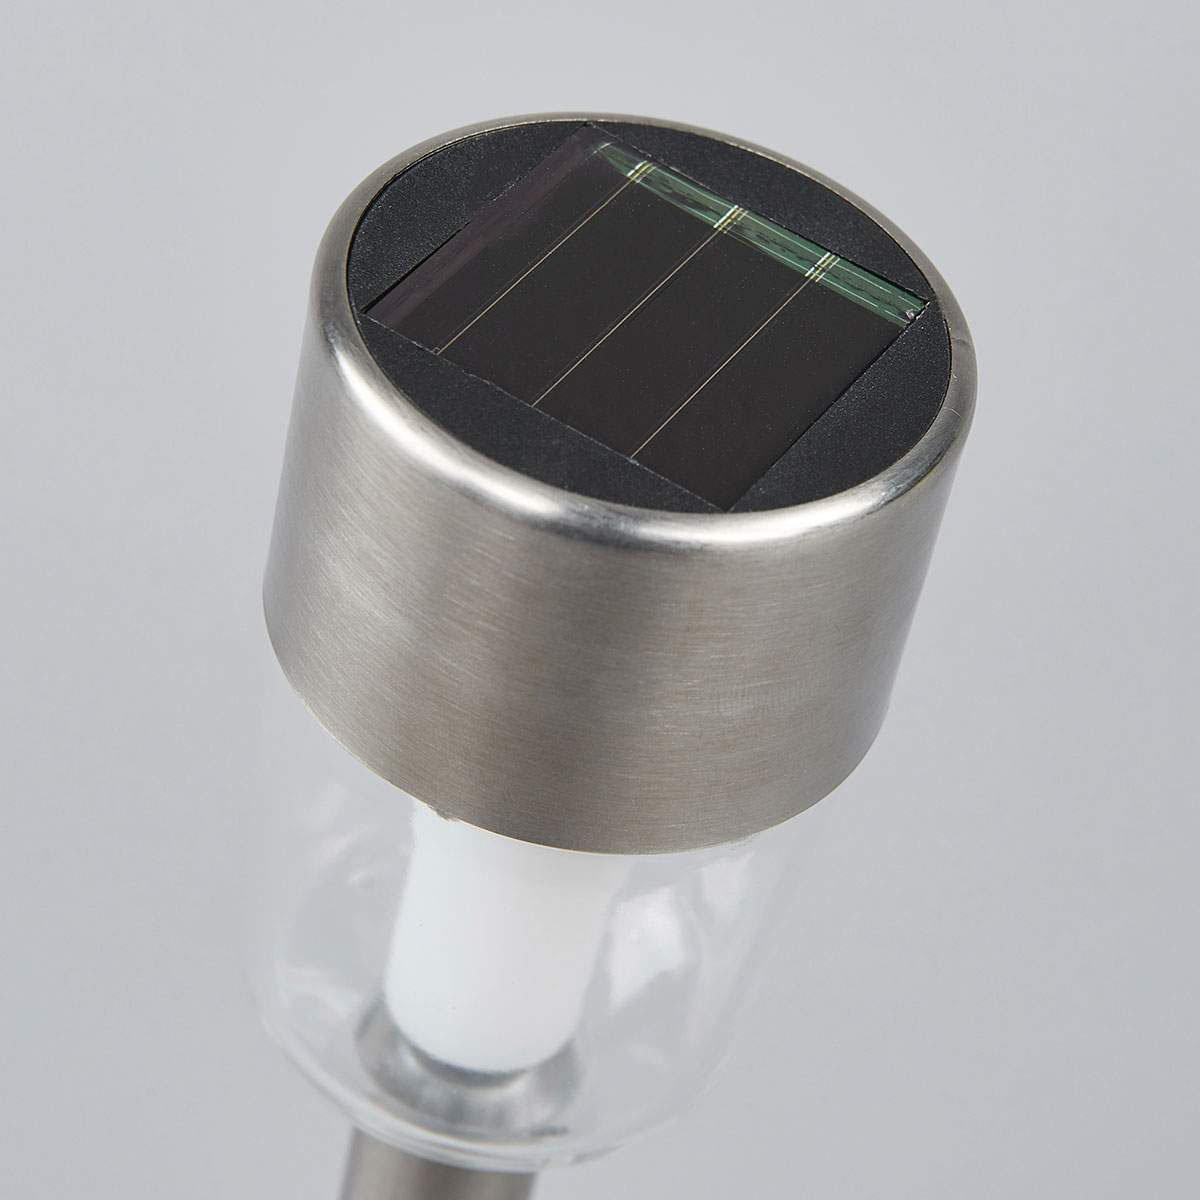 LED-Solarleuchten Maarten, 10er Set, 35,5x6,1x6,1 cm, Edelstahl, silber | #3